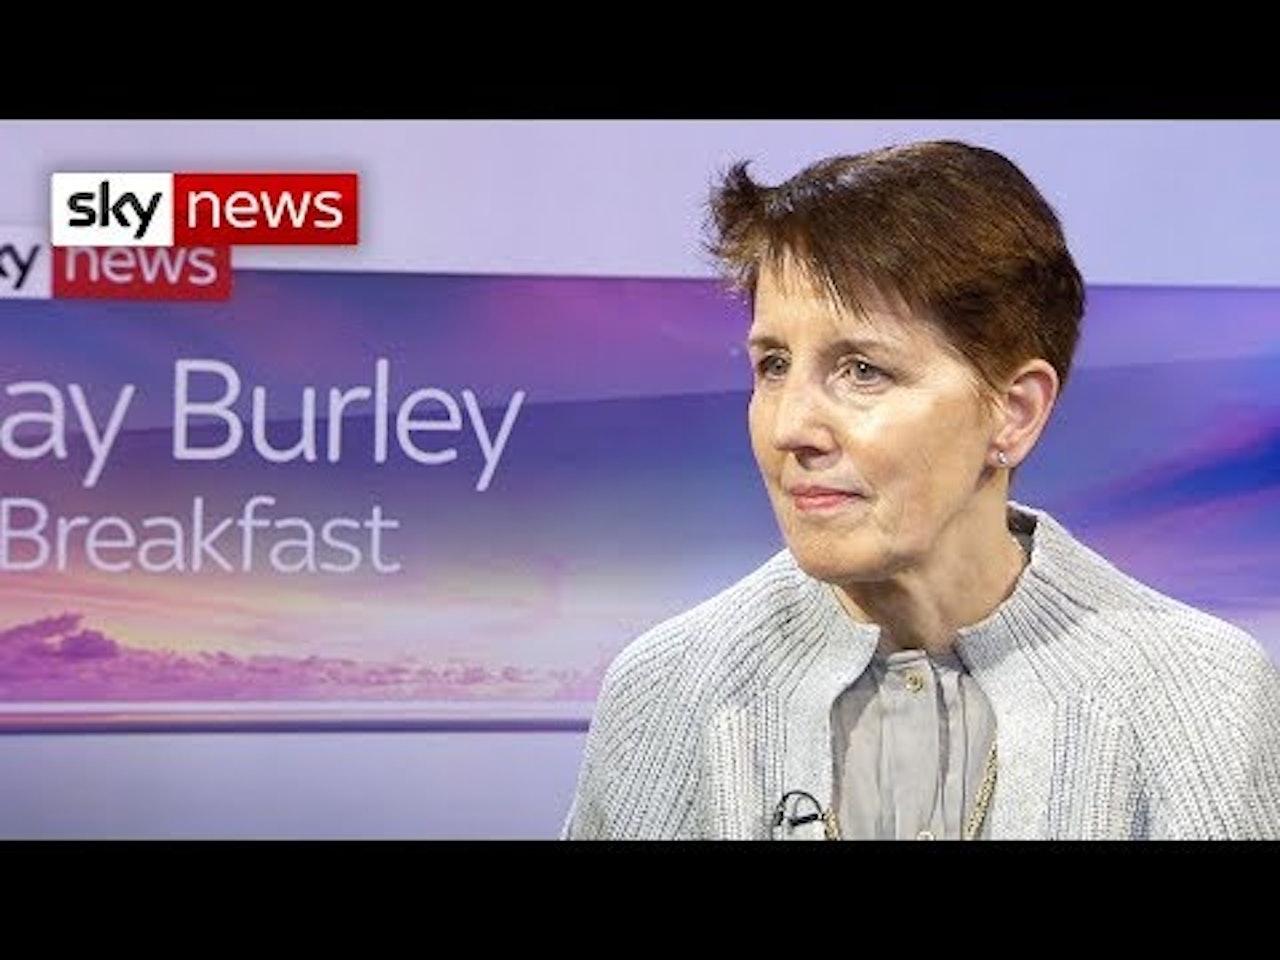 Public Health England director: 'Coronavirus likely to already be in the UK'